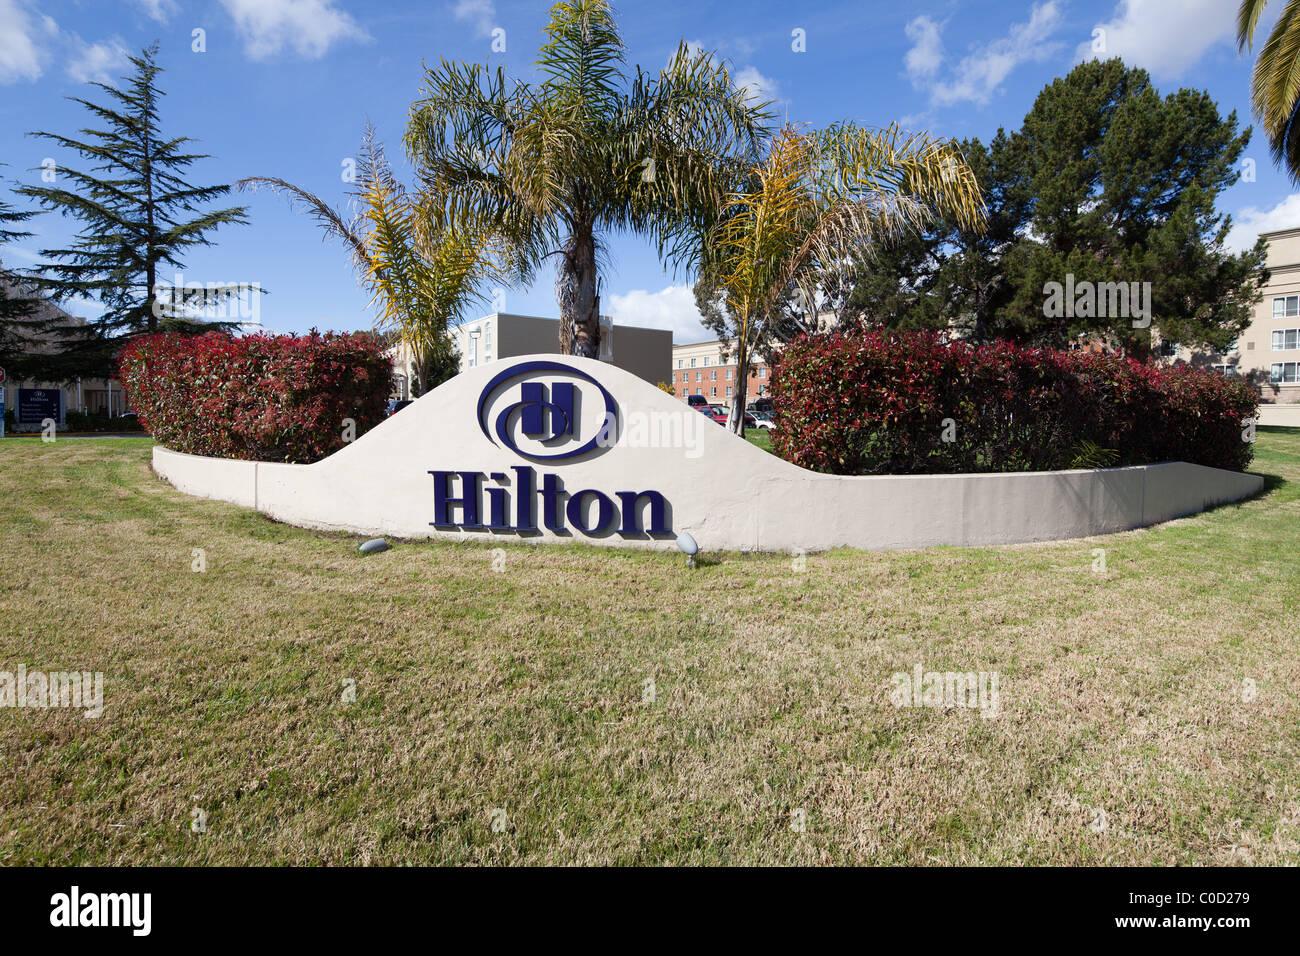 Hilton Hotel sign at the Oakland International Airport (OAK). - Stock Image